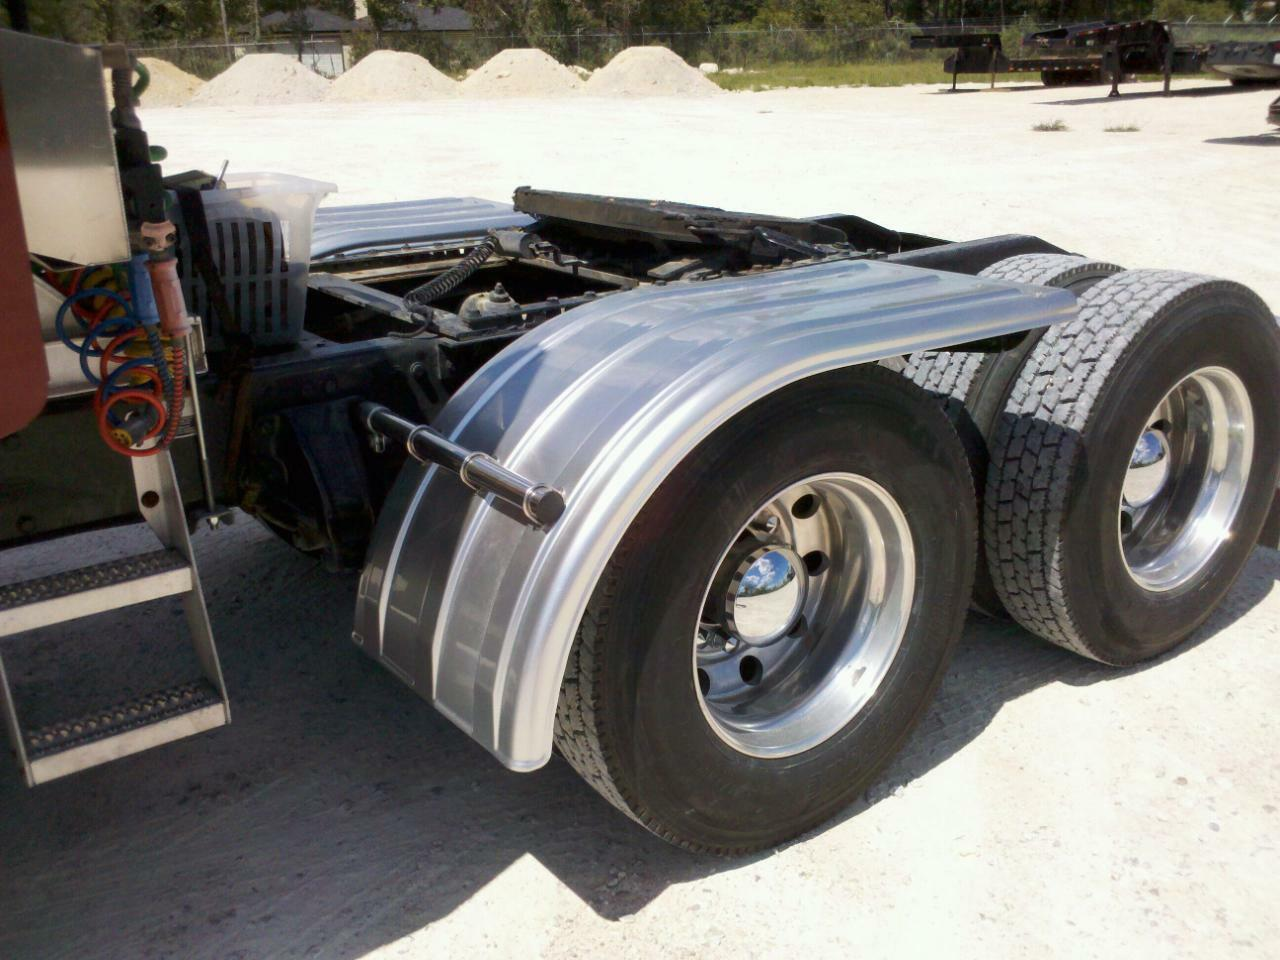 Half Fenders For Trucks : The half brute minimizer poly fender series liquid